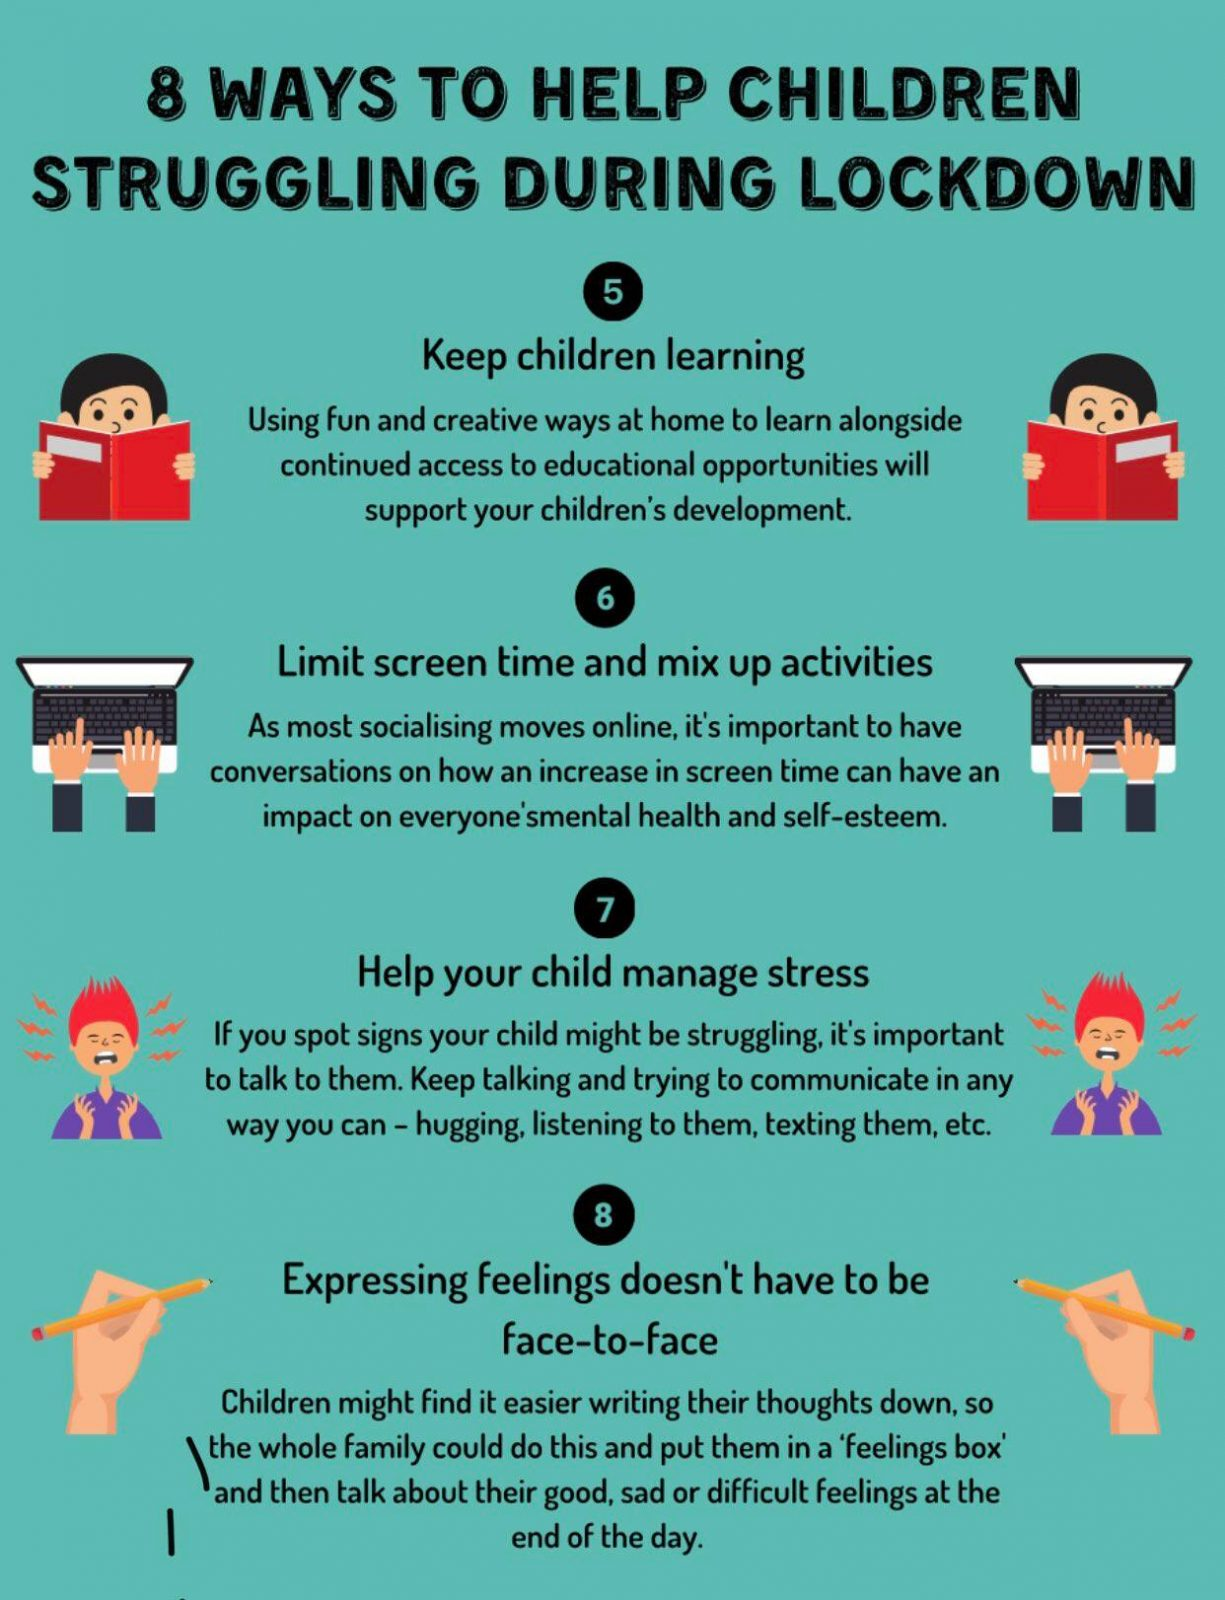 8 ways to help a child in lockdown 2